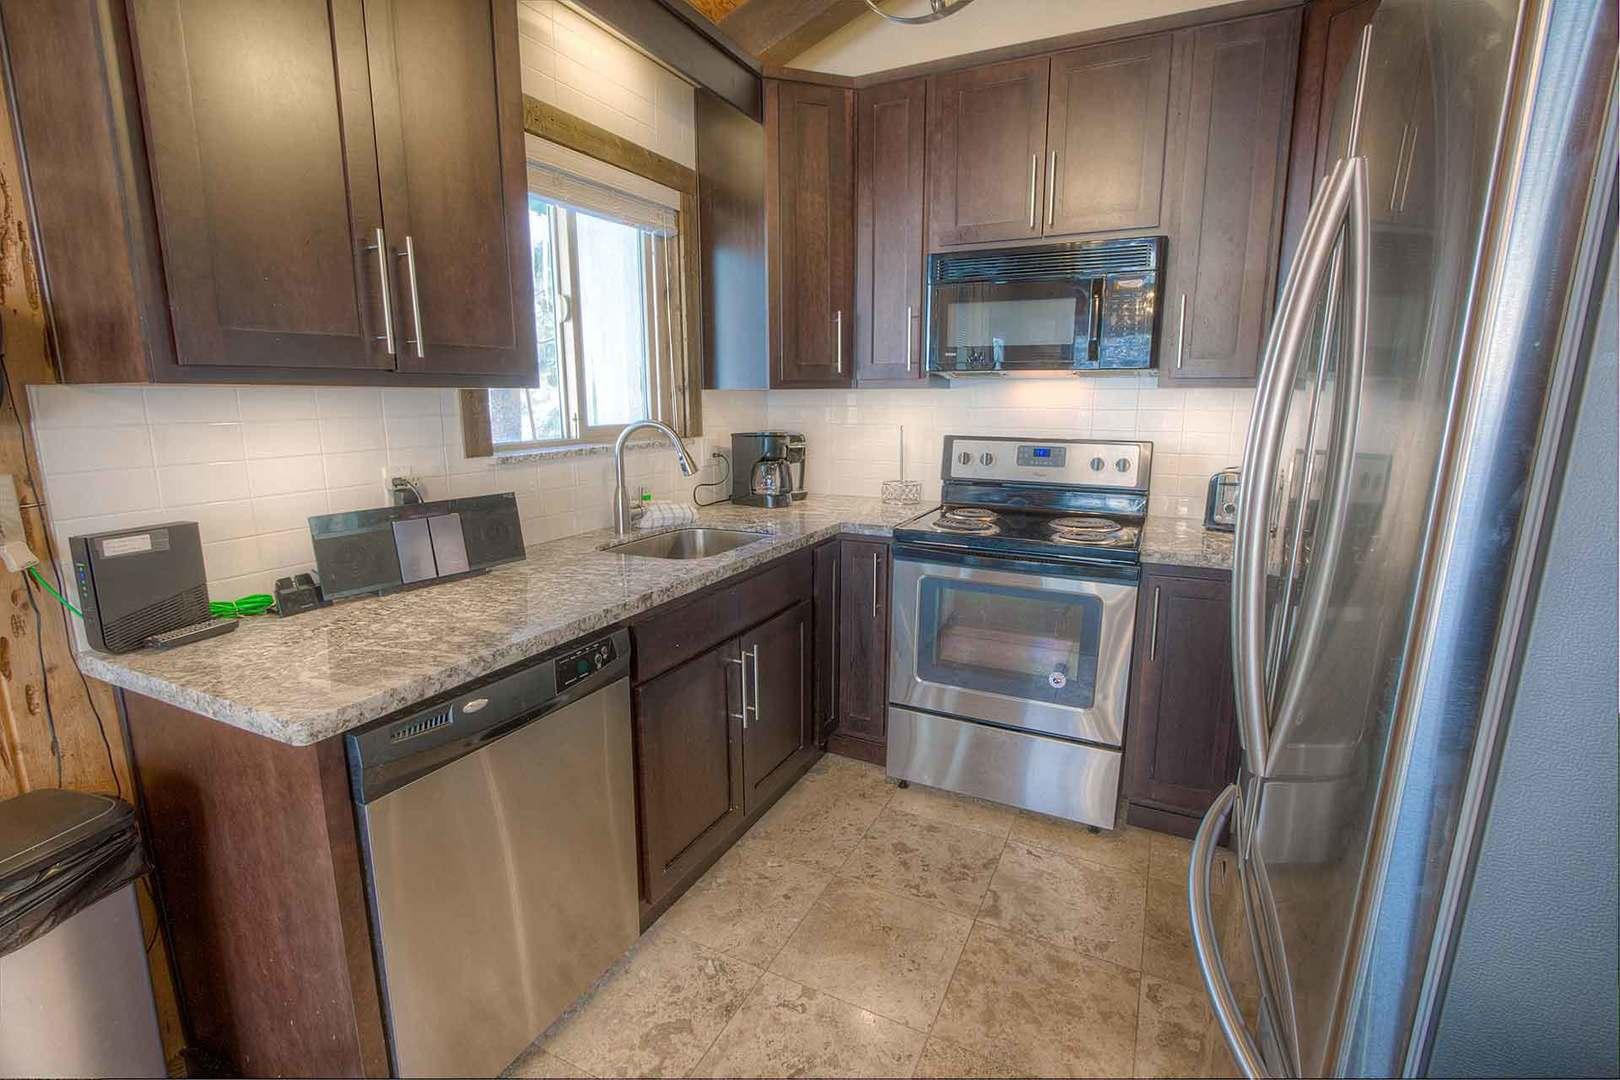 hnc0804 kitchen